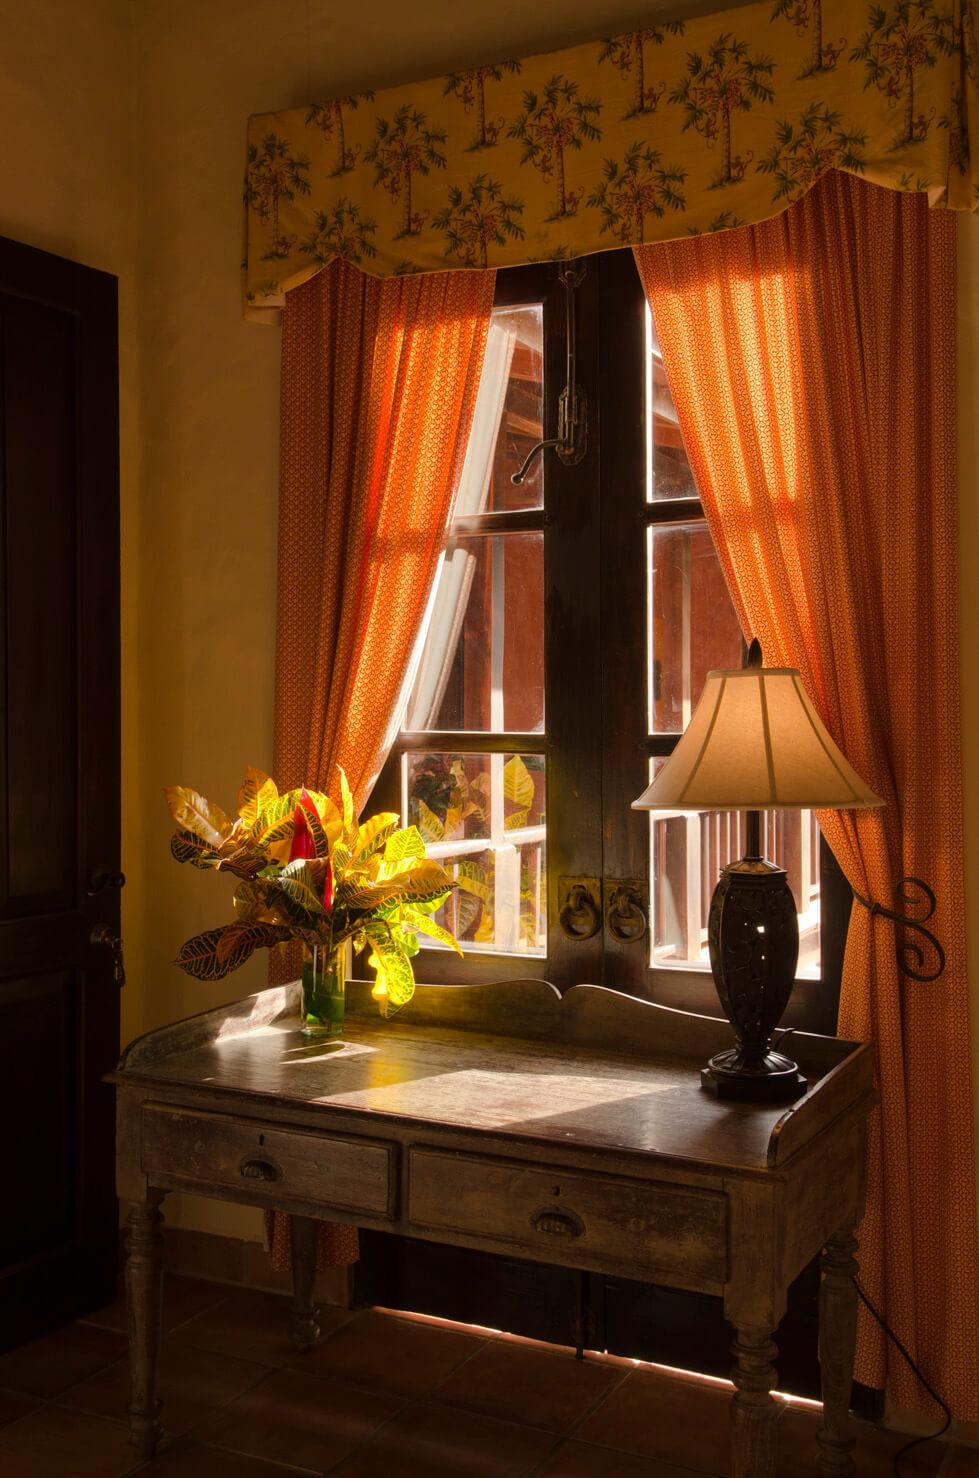 Barrigona Intimate And Romantic Accommodation